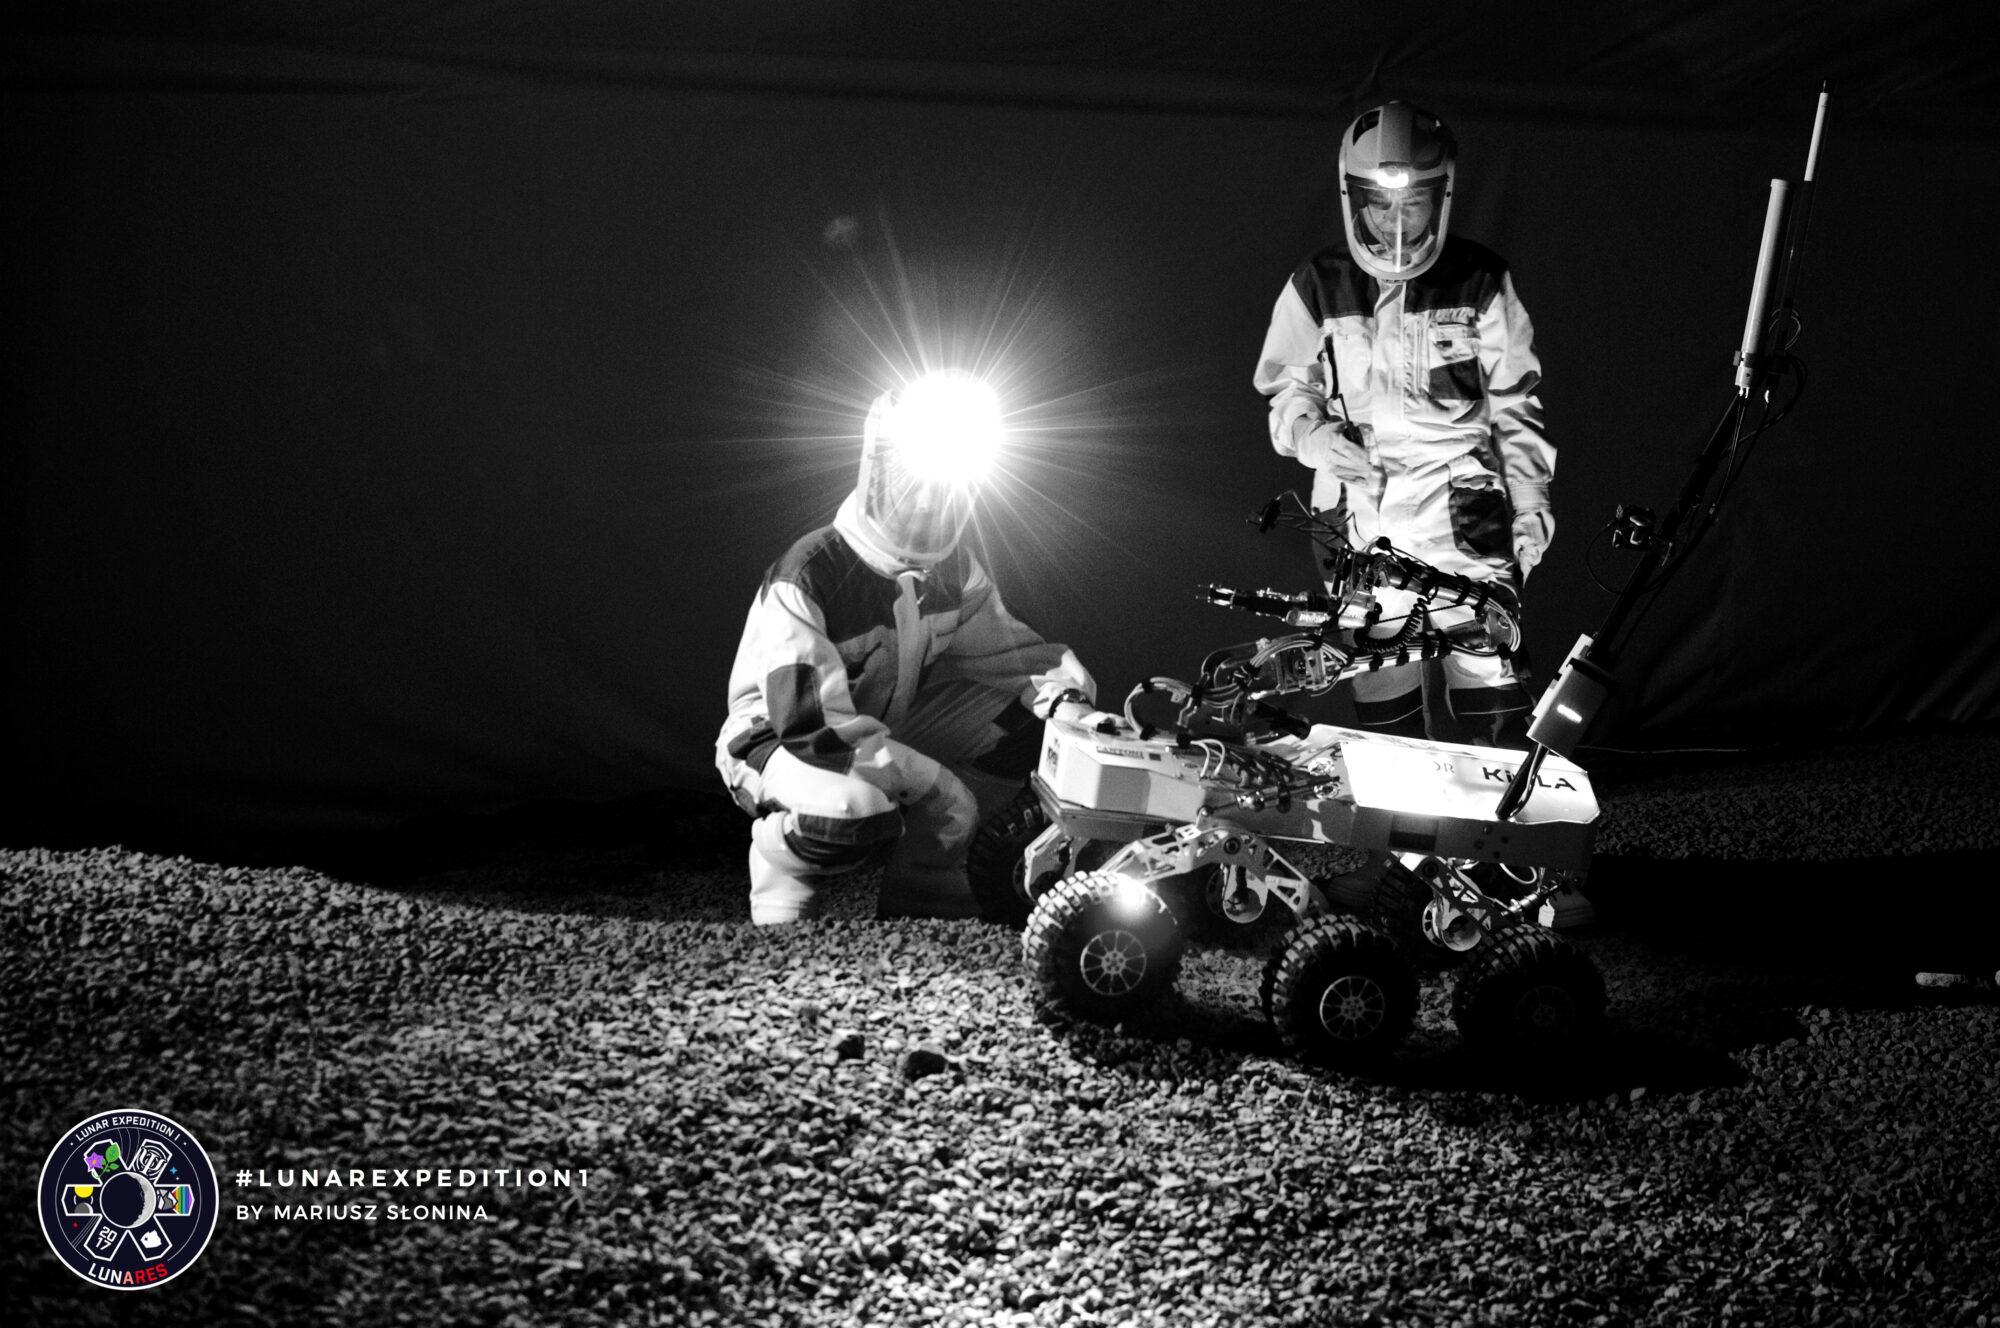 lunar-expedition-01/ND_20170819_150406_1372_001.jpg